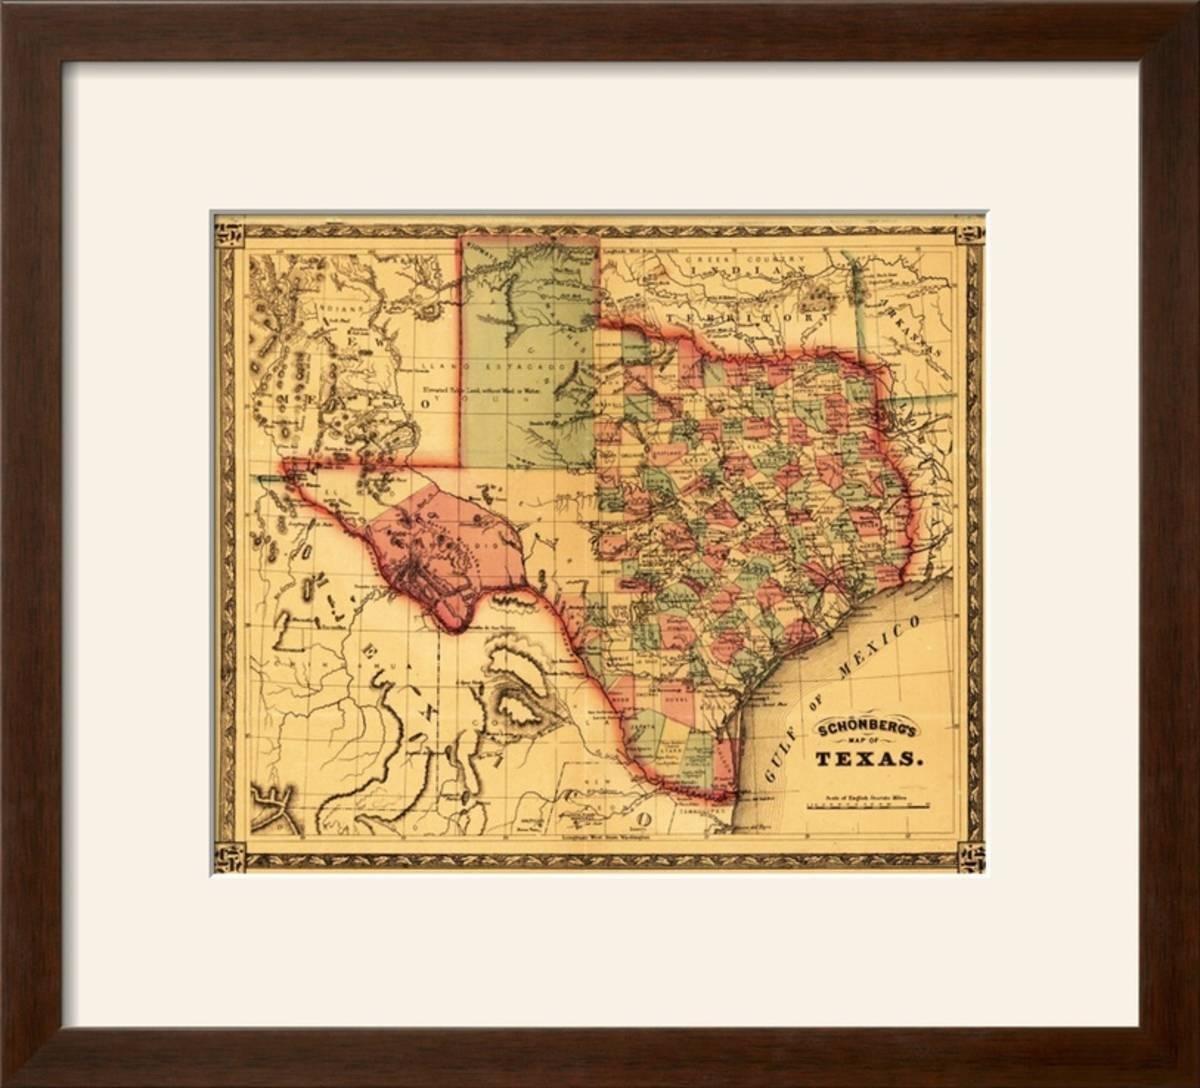 Charlton Home 'texas - Panoramic Map' Framed Graphic Art Print | Wayfair - Framed Texas Map